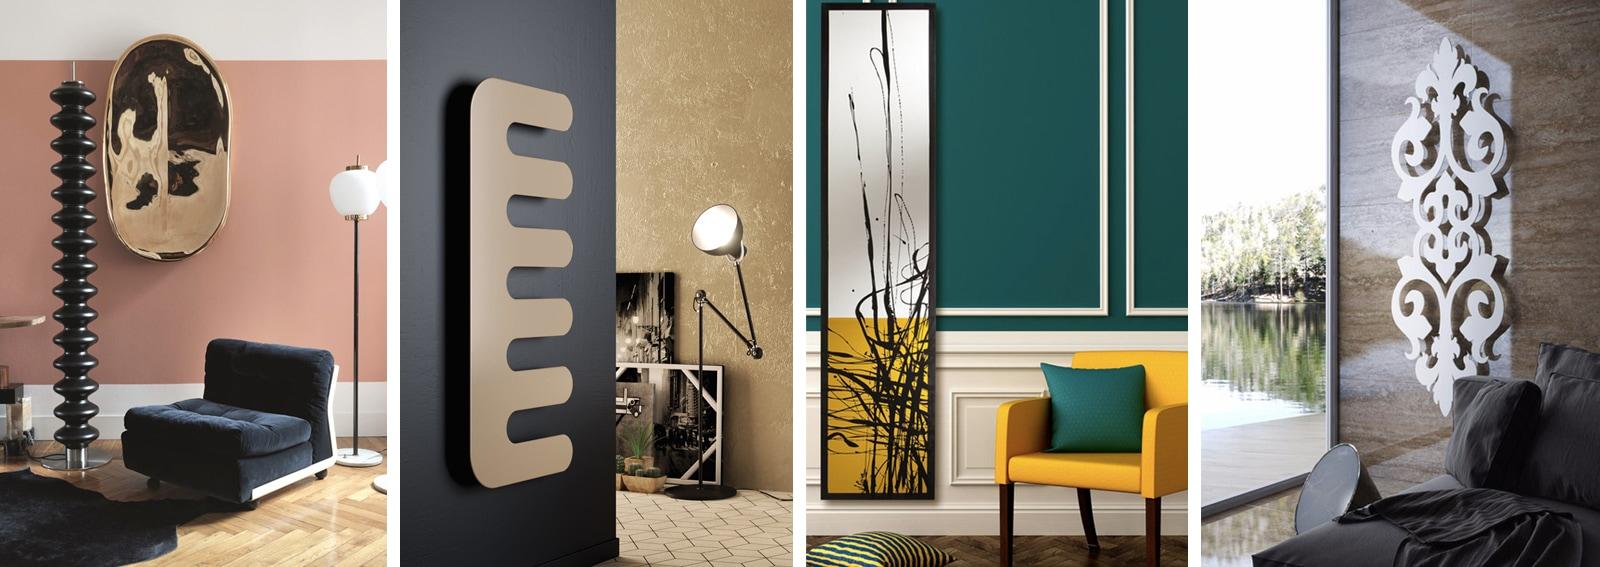 cover-termosifoni-arredamento-design-desktop